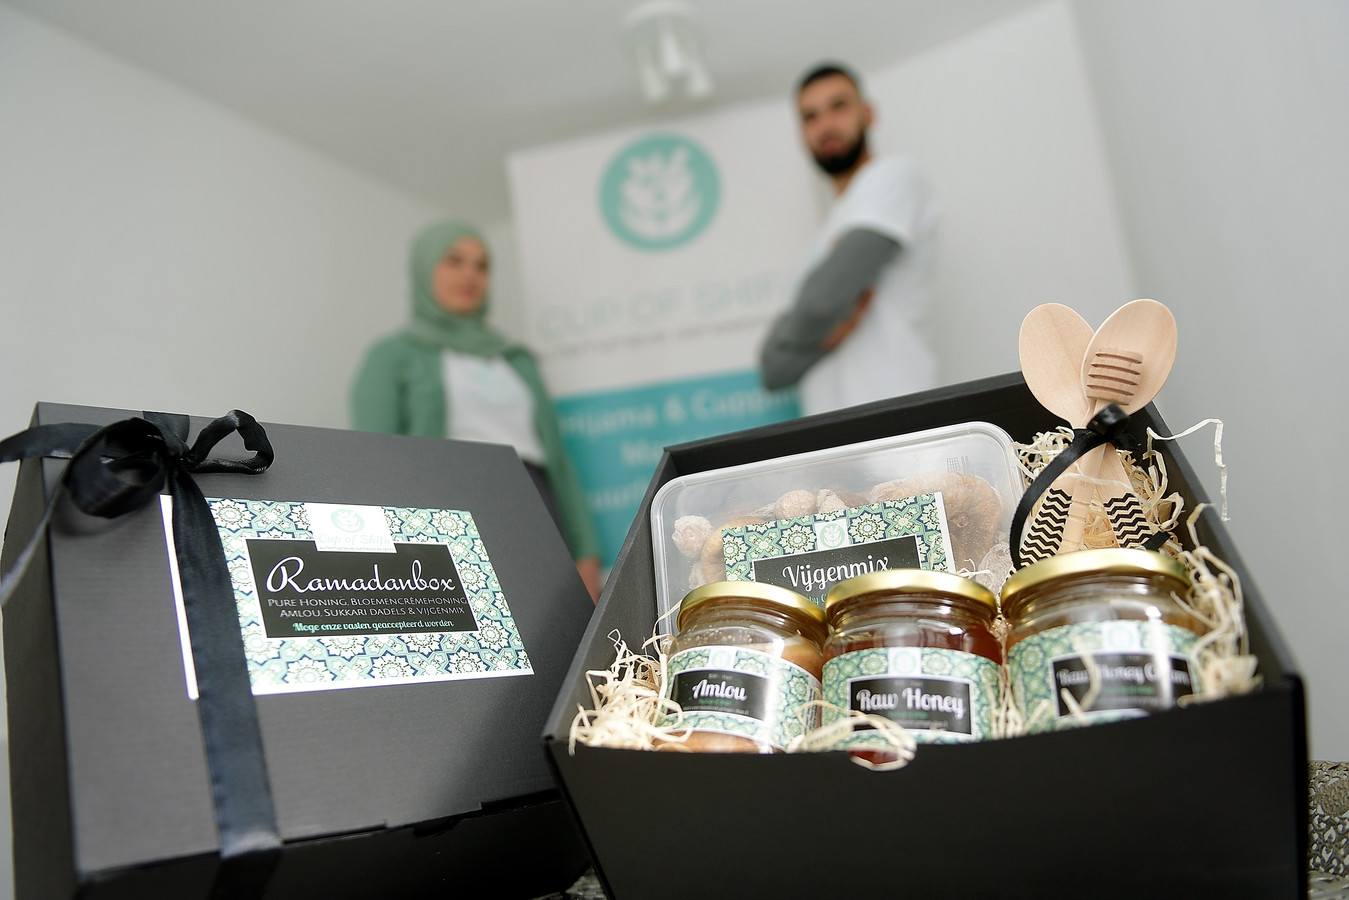 Ramadanbox van bedrijf Cup of Shifa. Op de foto eigenaren Leah Delaney (l) en Oussama Hamdoune (r)